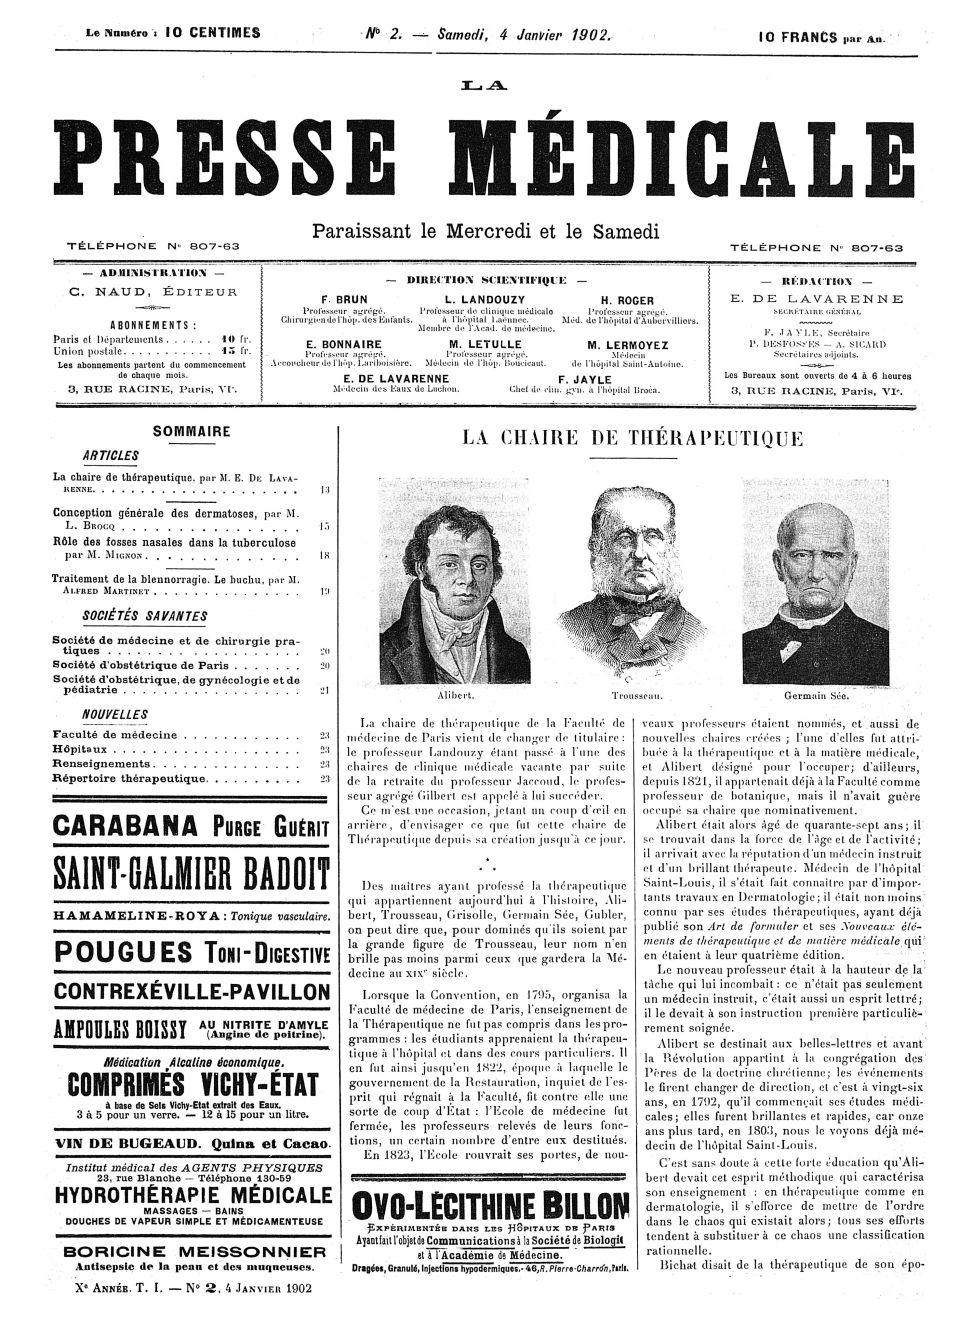 Alibert / Trousseau / Germain Sée - La Presse médicale - [Articles originaux] -  - med100000x1902xartorigx0017